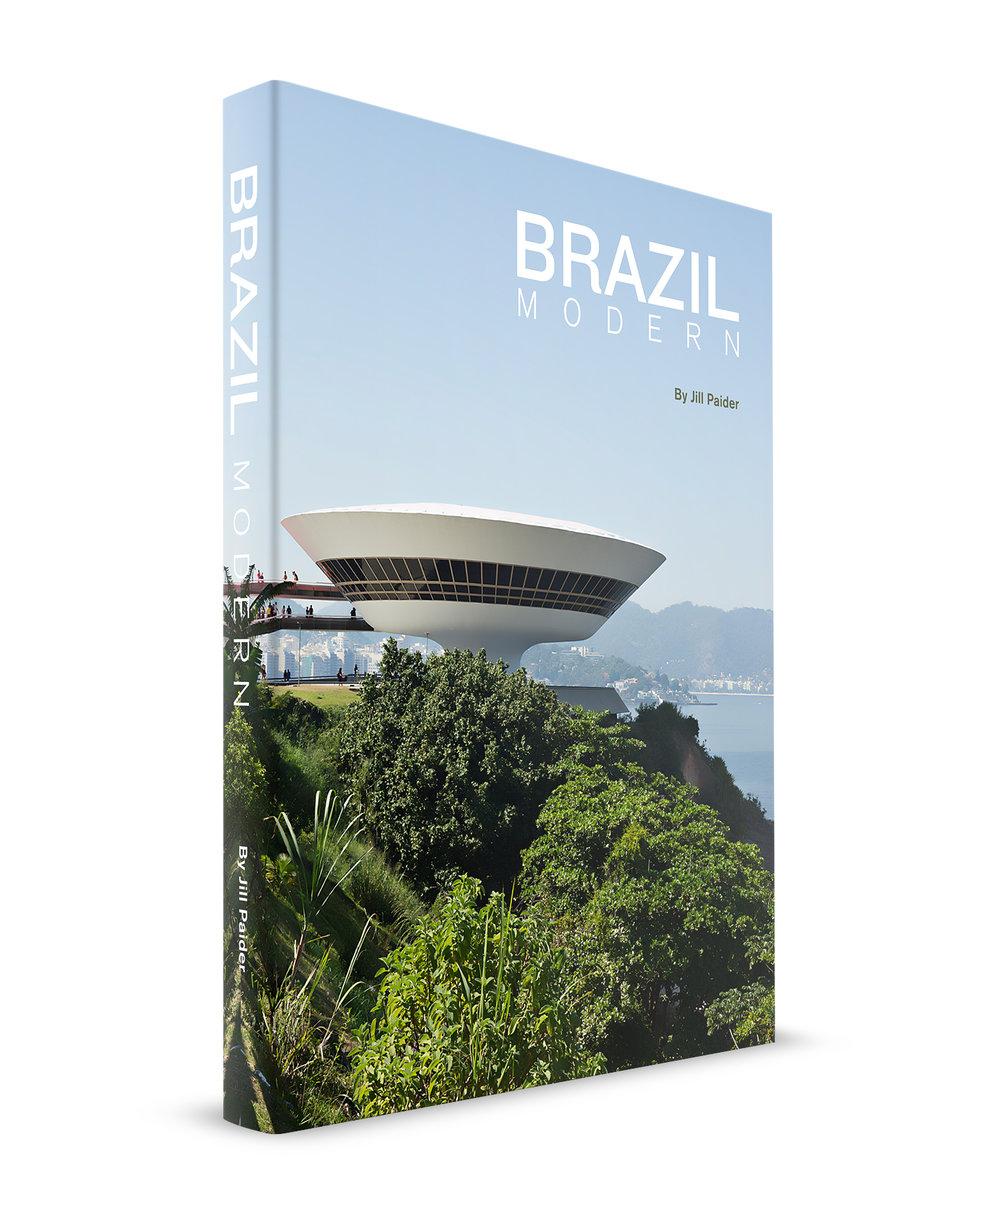 BRAZIL MODERN - LIMITED EDITION